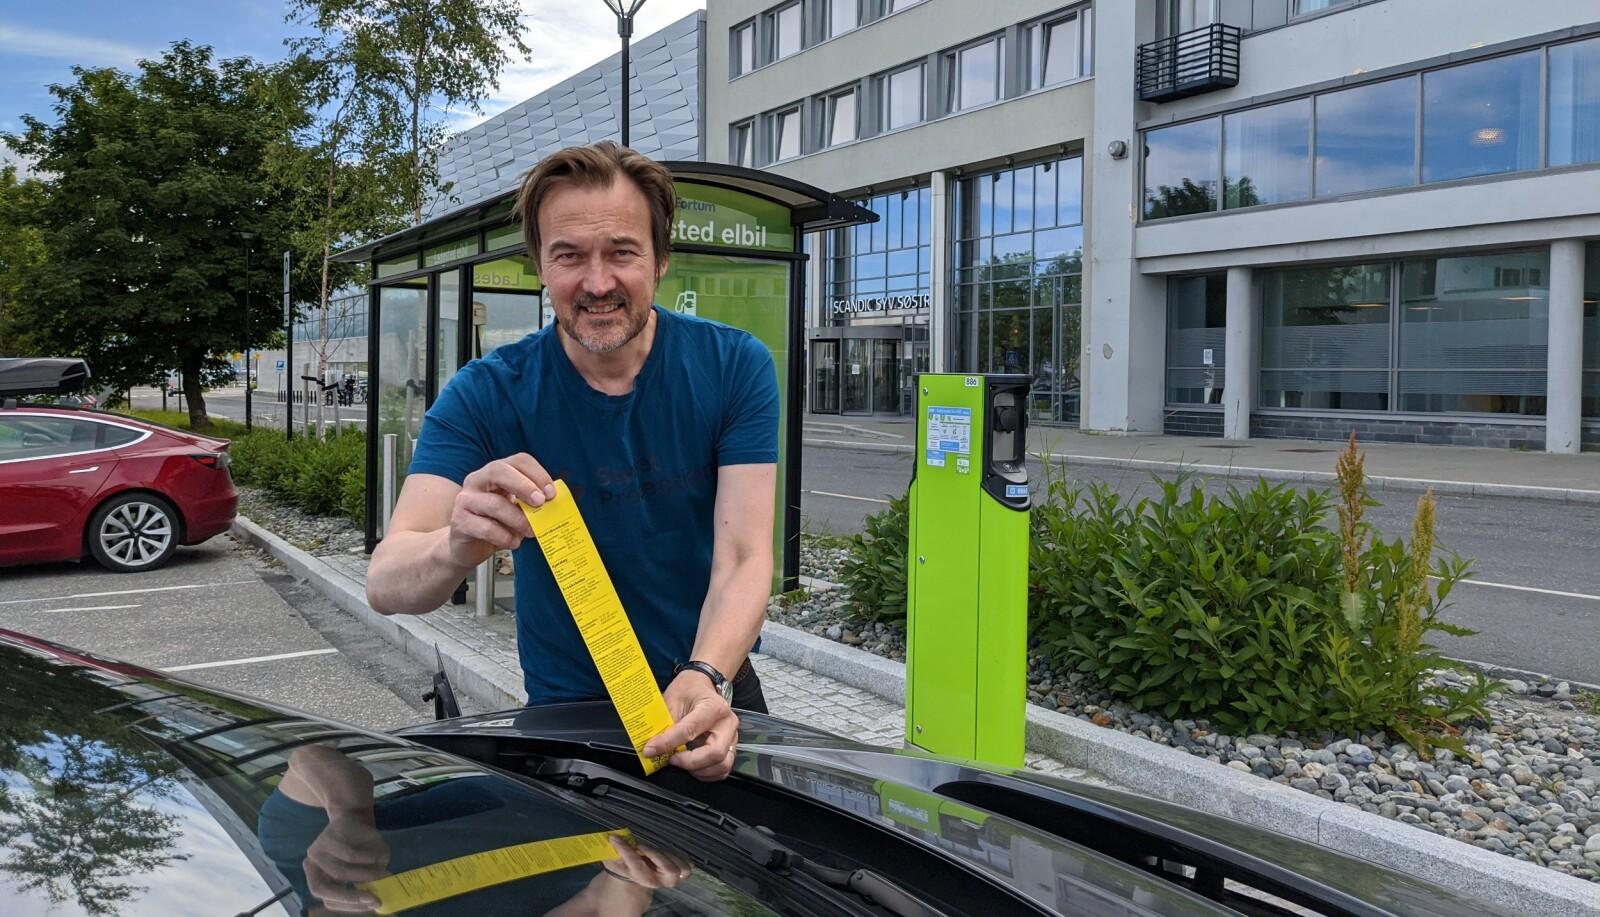 PARKERINGSBOT: Takk til Sandnessjøen kommune for 600 kroner i bot mens vi ladet elbil på Forum Charge & Drive. På stedet måtte vi betale både for lading og parkering. FOTO: JAN THORESEN